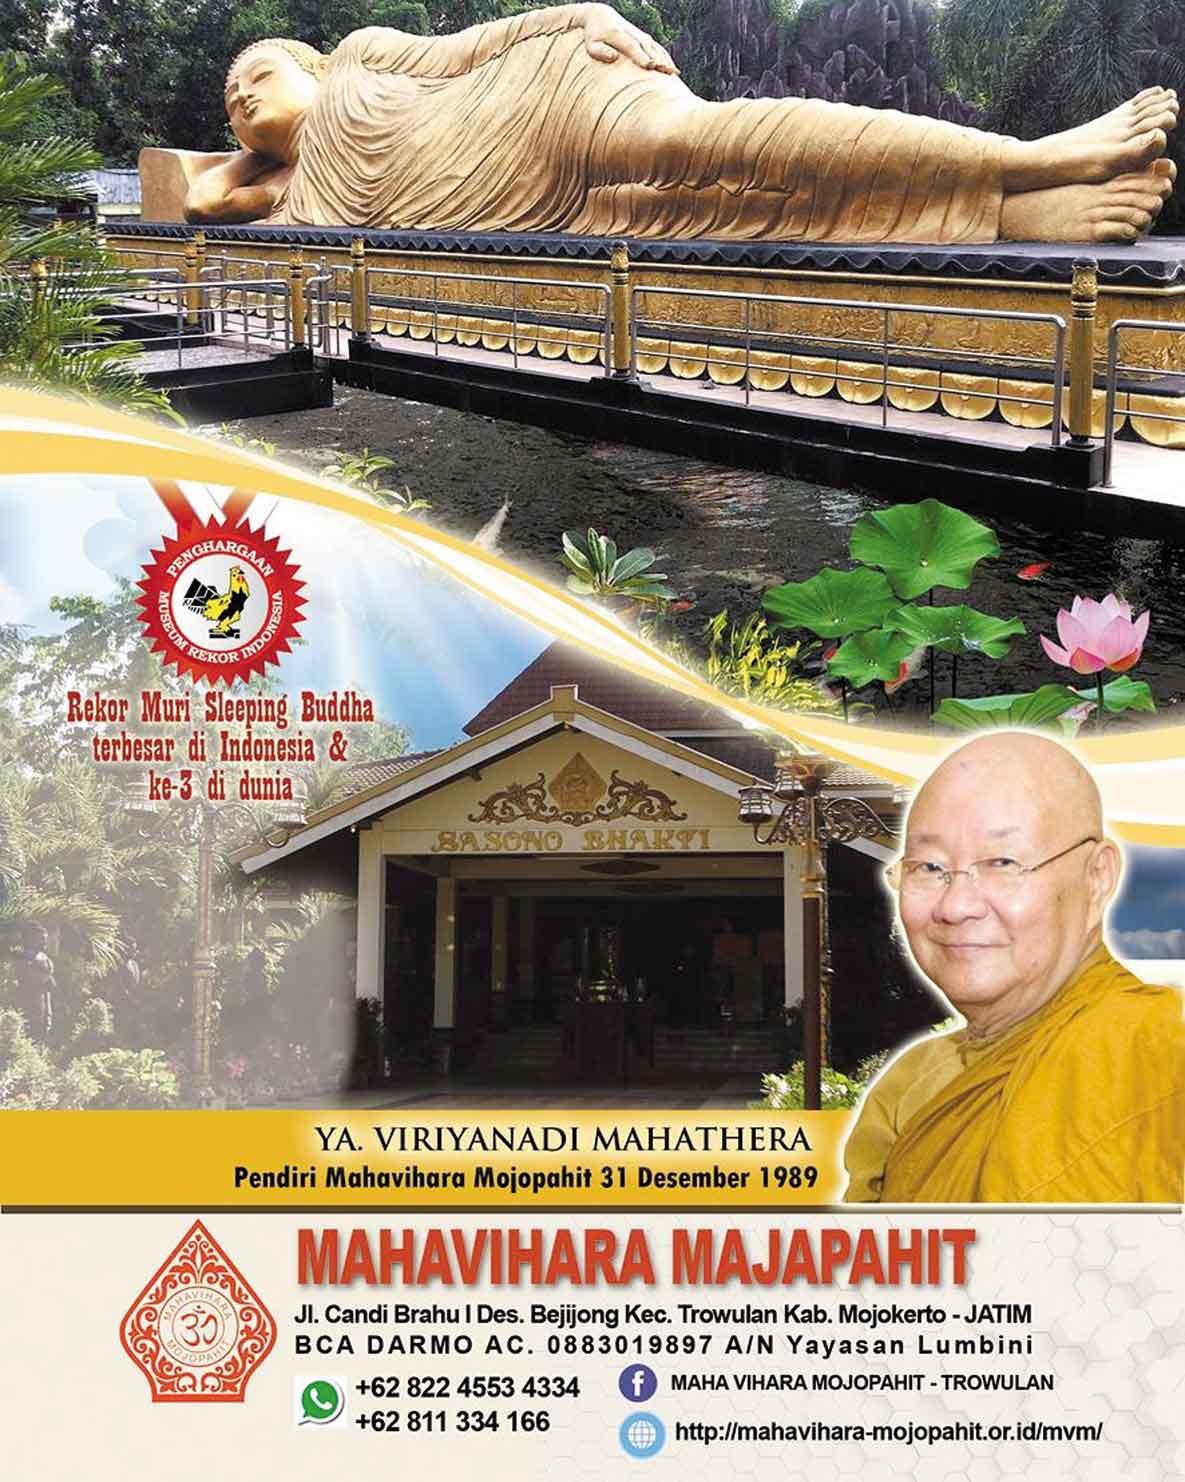 Mahavihara Mojopahit Kampung Wisata Budaya Trowulan Swaranews Dua Setelah Diresmikan